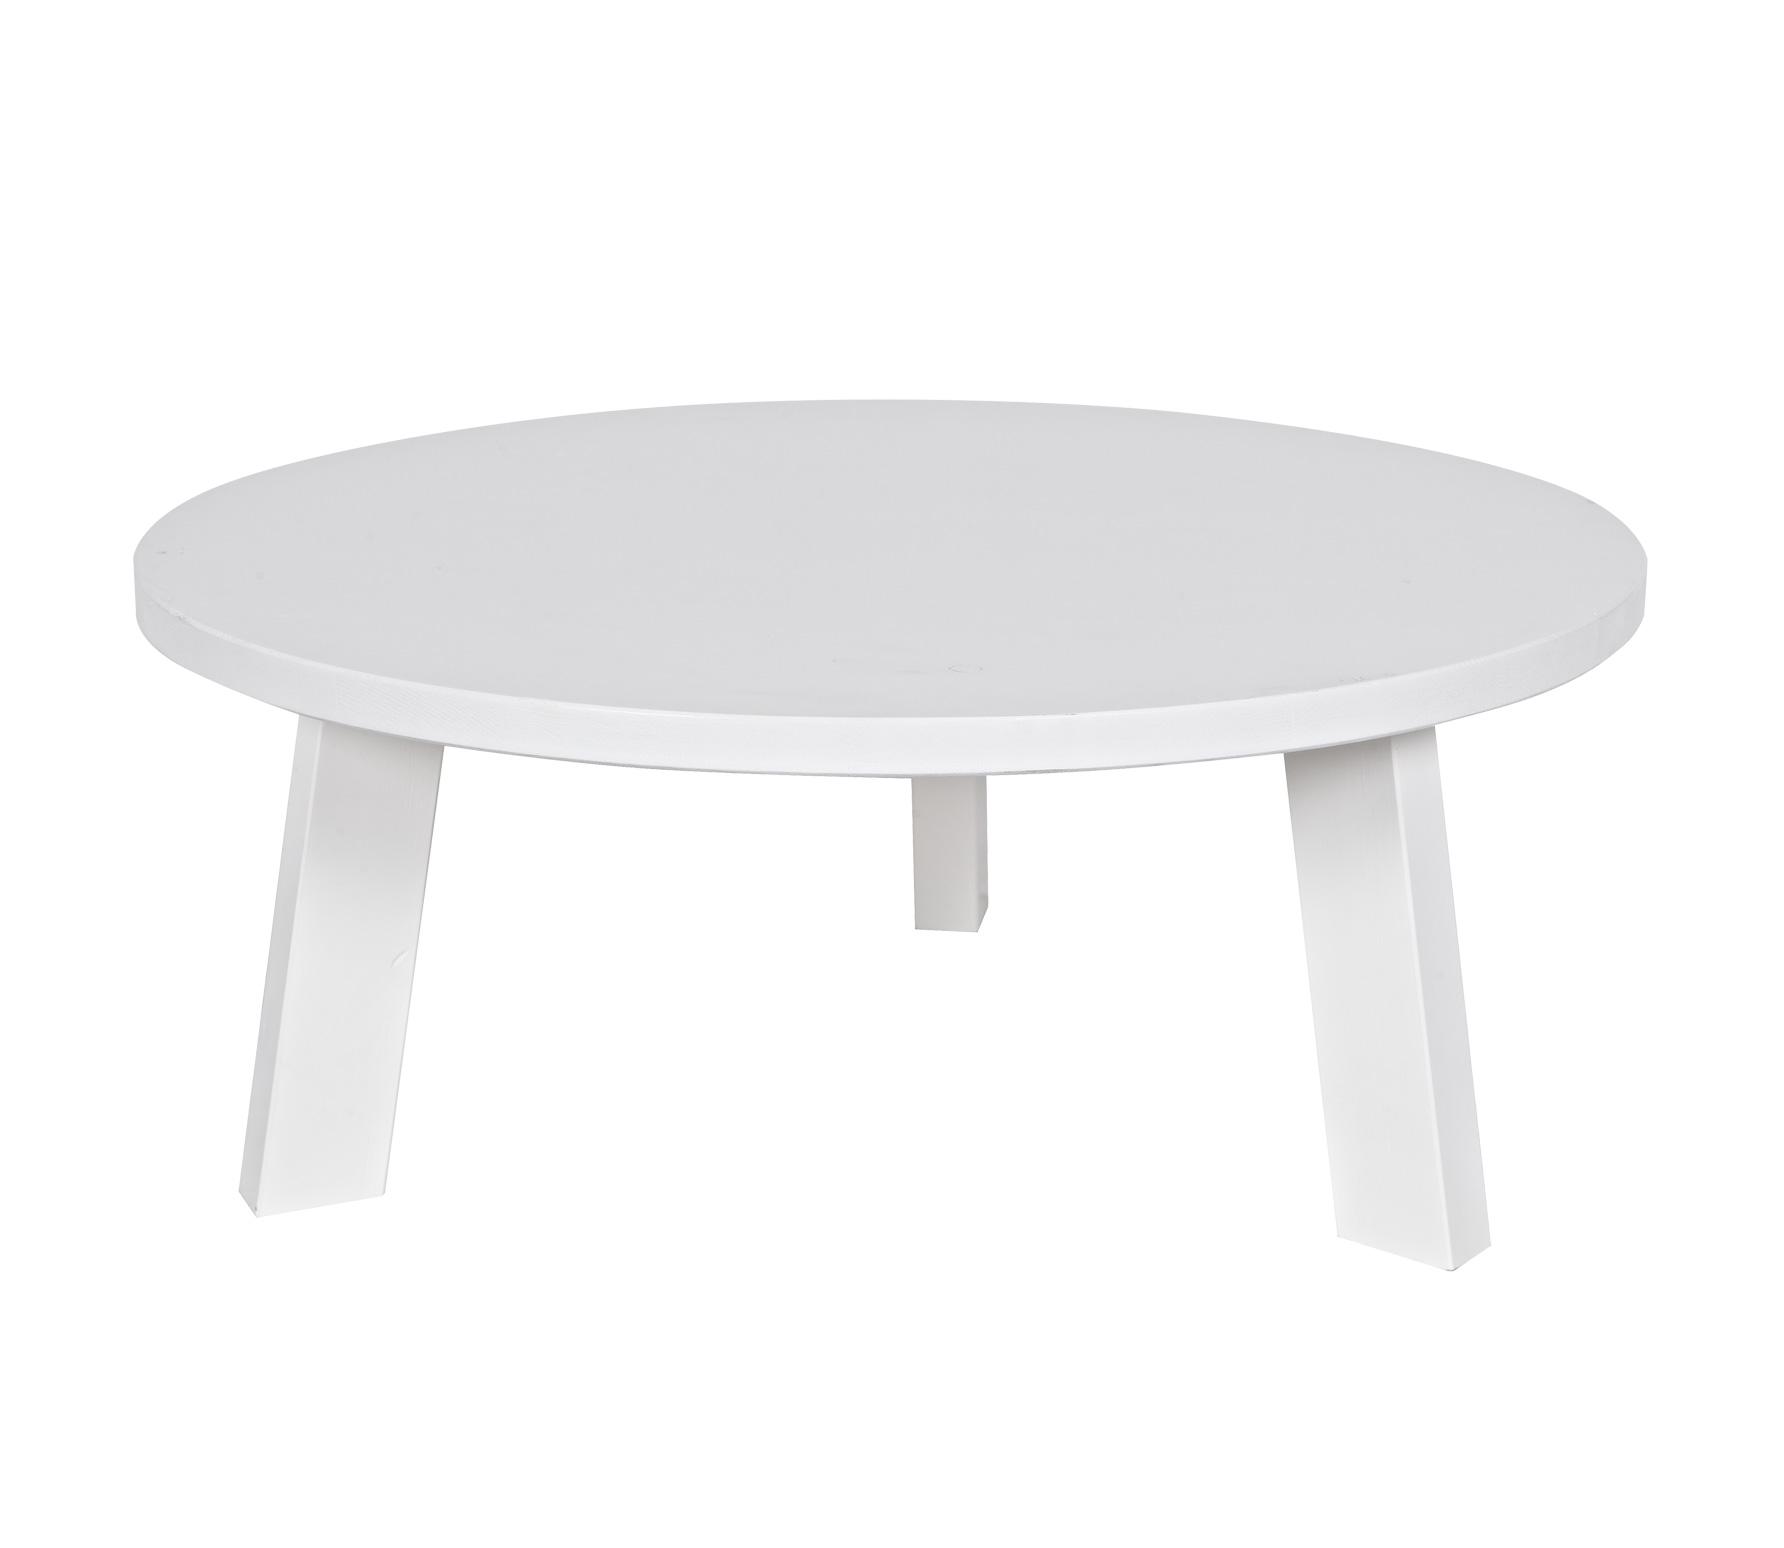 Witte Ronde Salon Tafel.Woood Rhonda Salontafel Wit Grenen O 80 Cm Wit